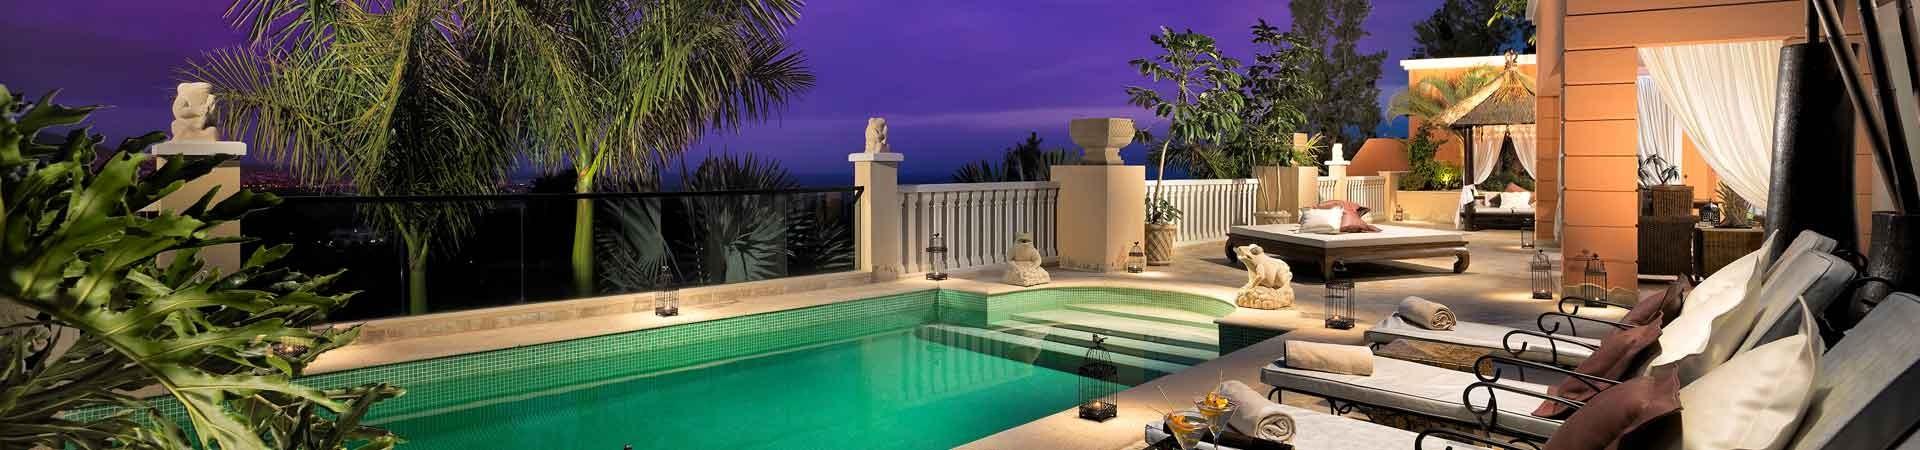 https://www.goodmorningtenerife.com/wp-content/uploads/2015/01/02_slide_hotel-Royal-Garden-Villas-Spa-1920x450.jpg